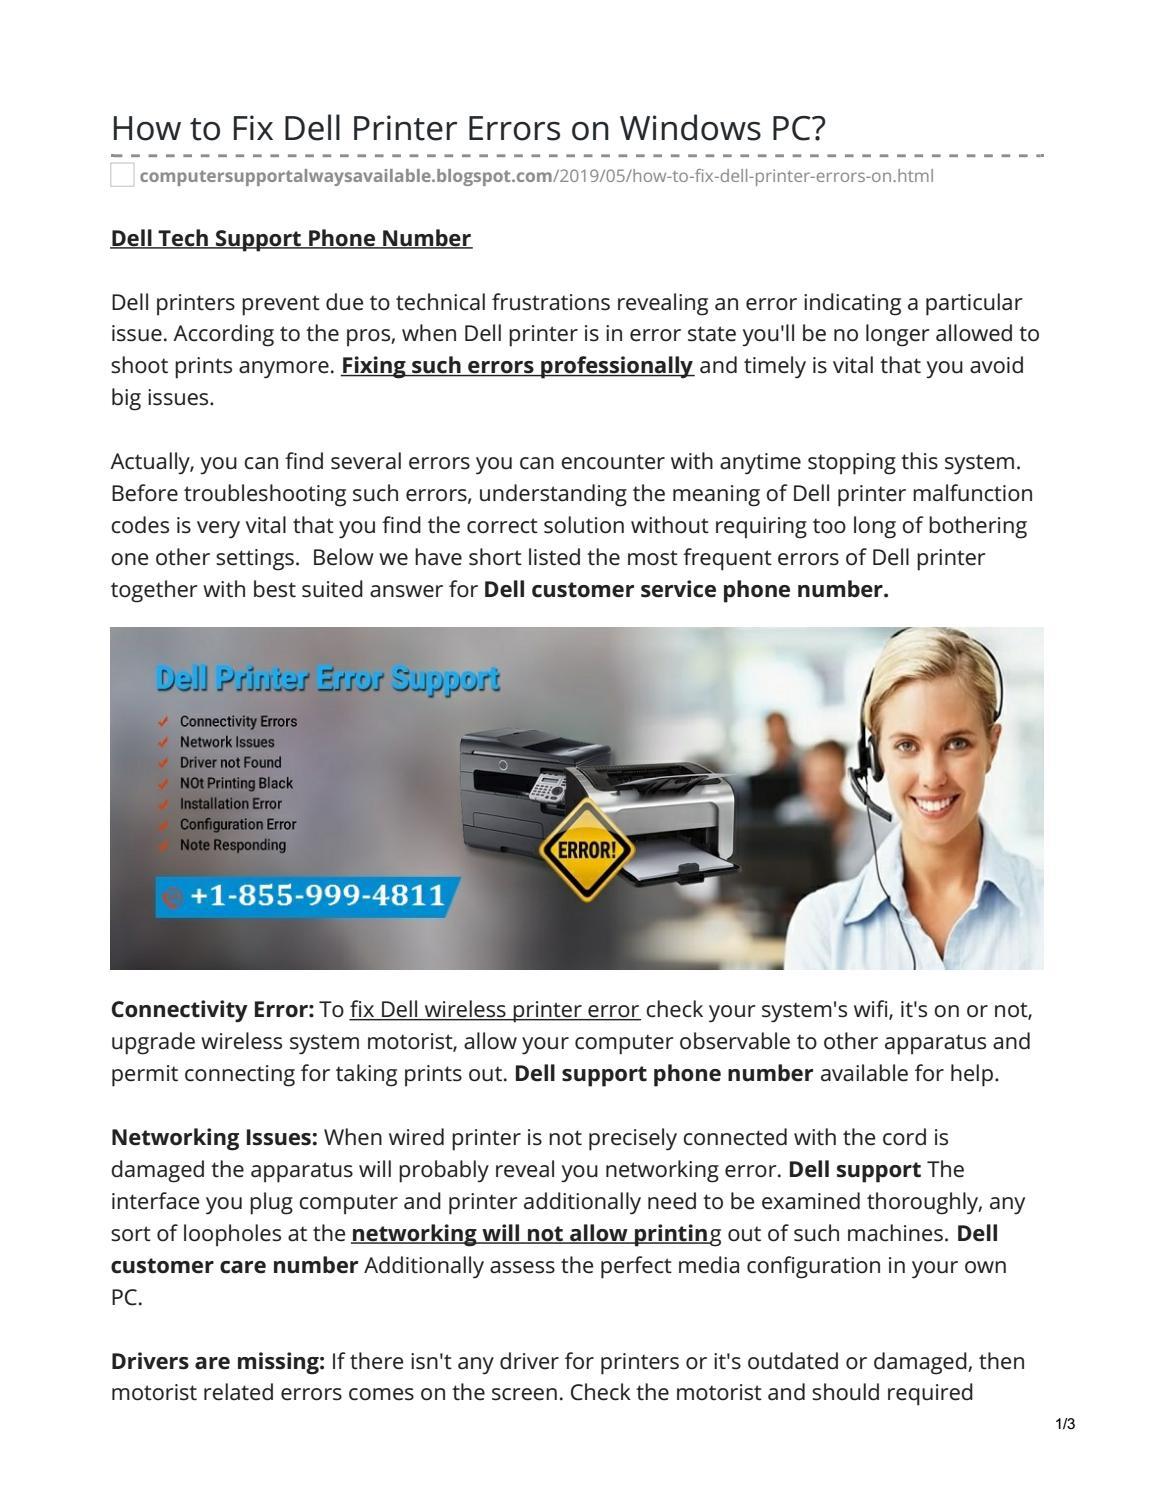 How to Fix Dell Printer Errors on Windows PC? by Iqra Saifi